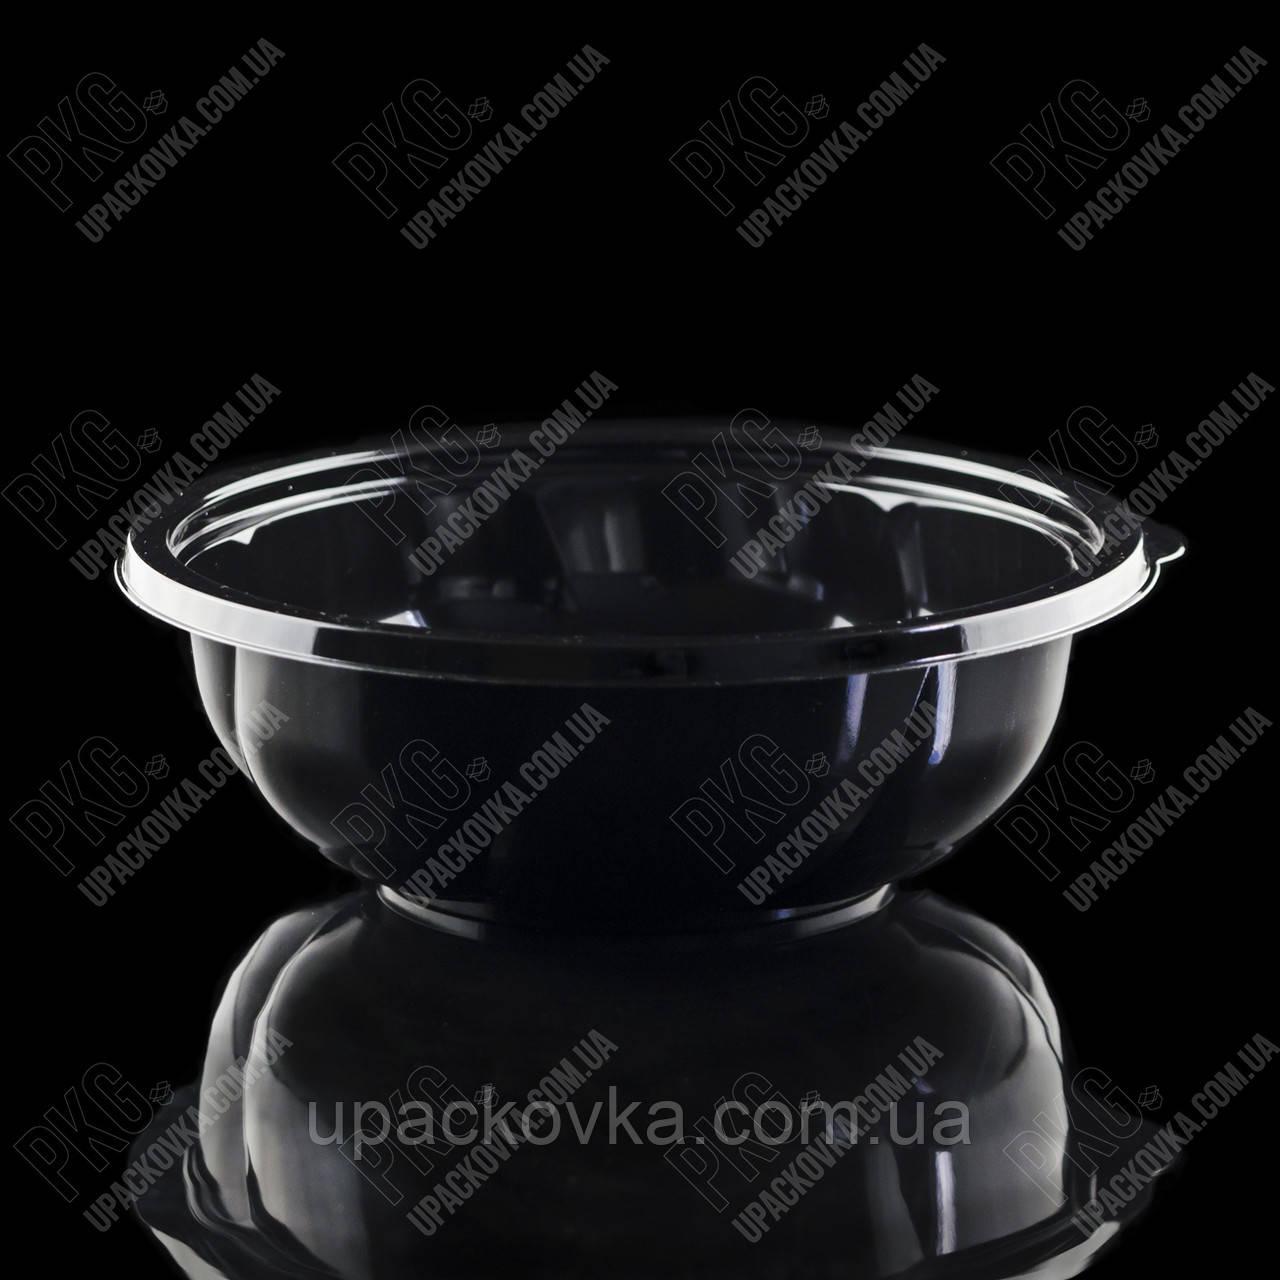 Упаковка для салата без крышки, УК-107, ЧЕРНАЯ, РЕТ, 1000 мл (300 шт/ящ)